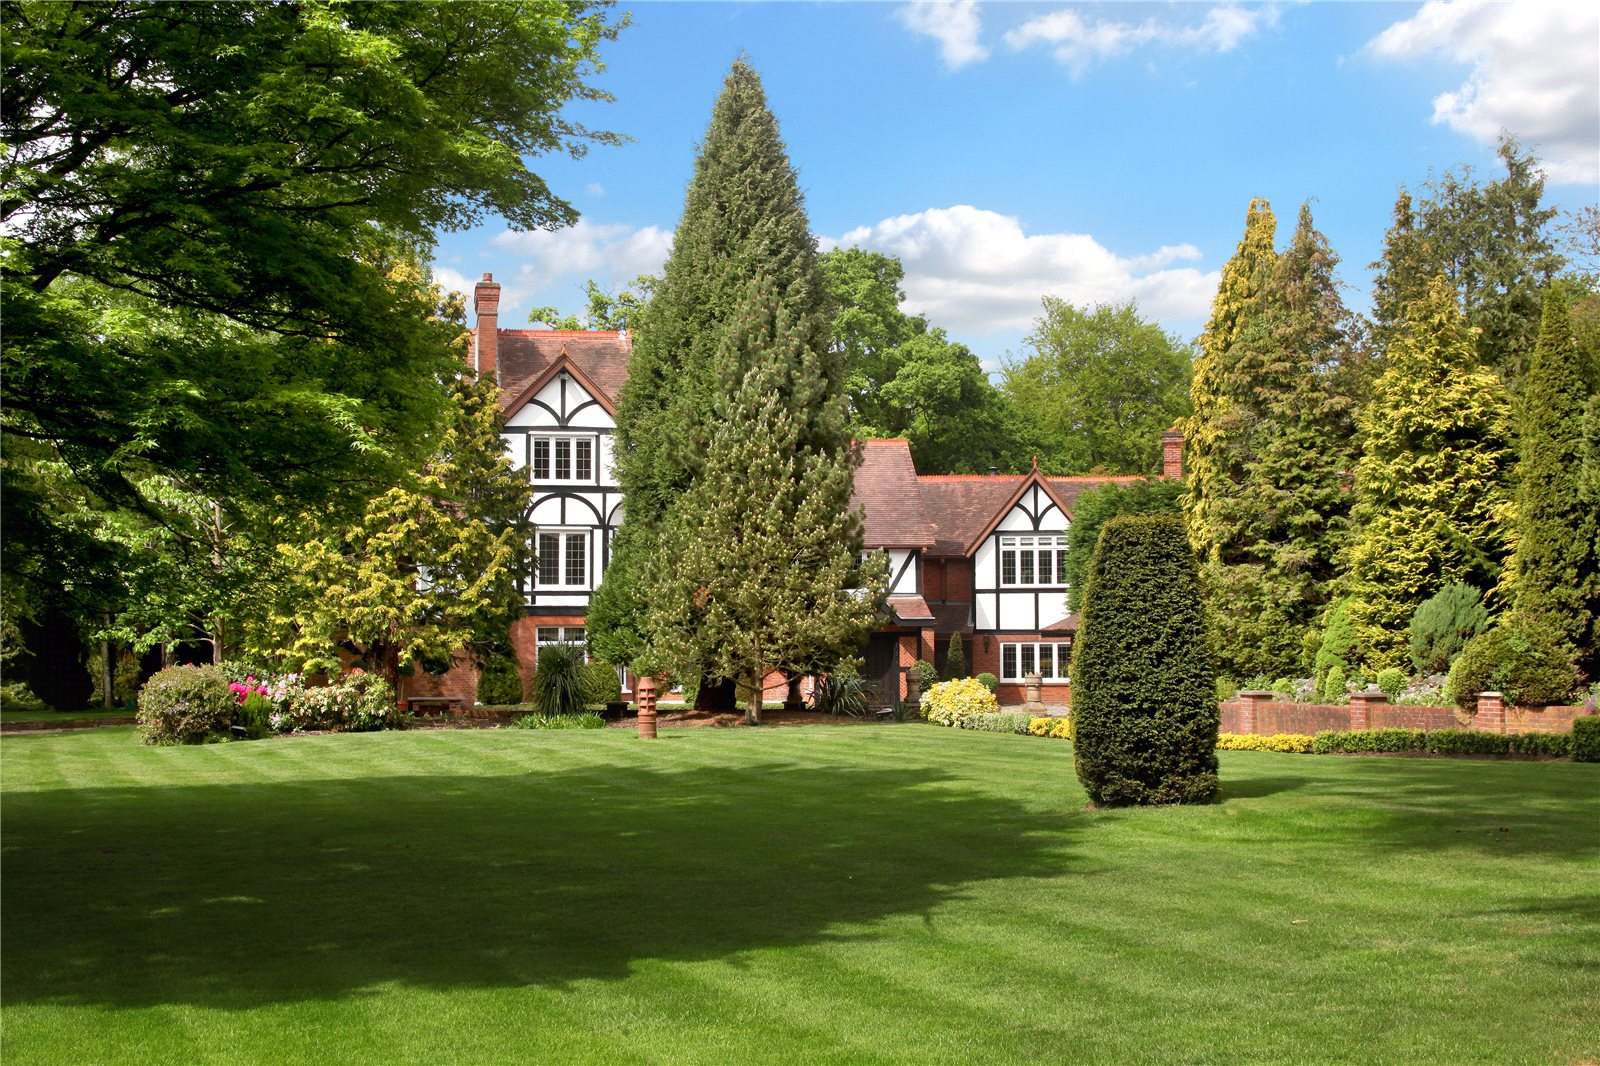 Single Family Home For Sale At Bishopsgate Road, Englefield Green, Egham,  Surrey,